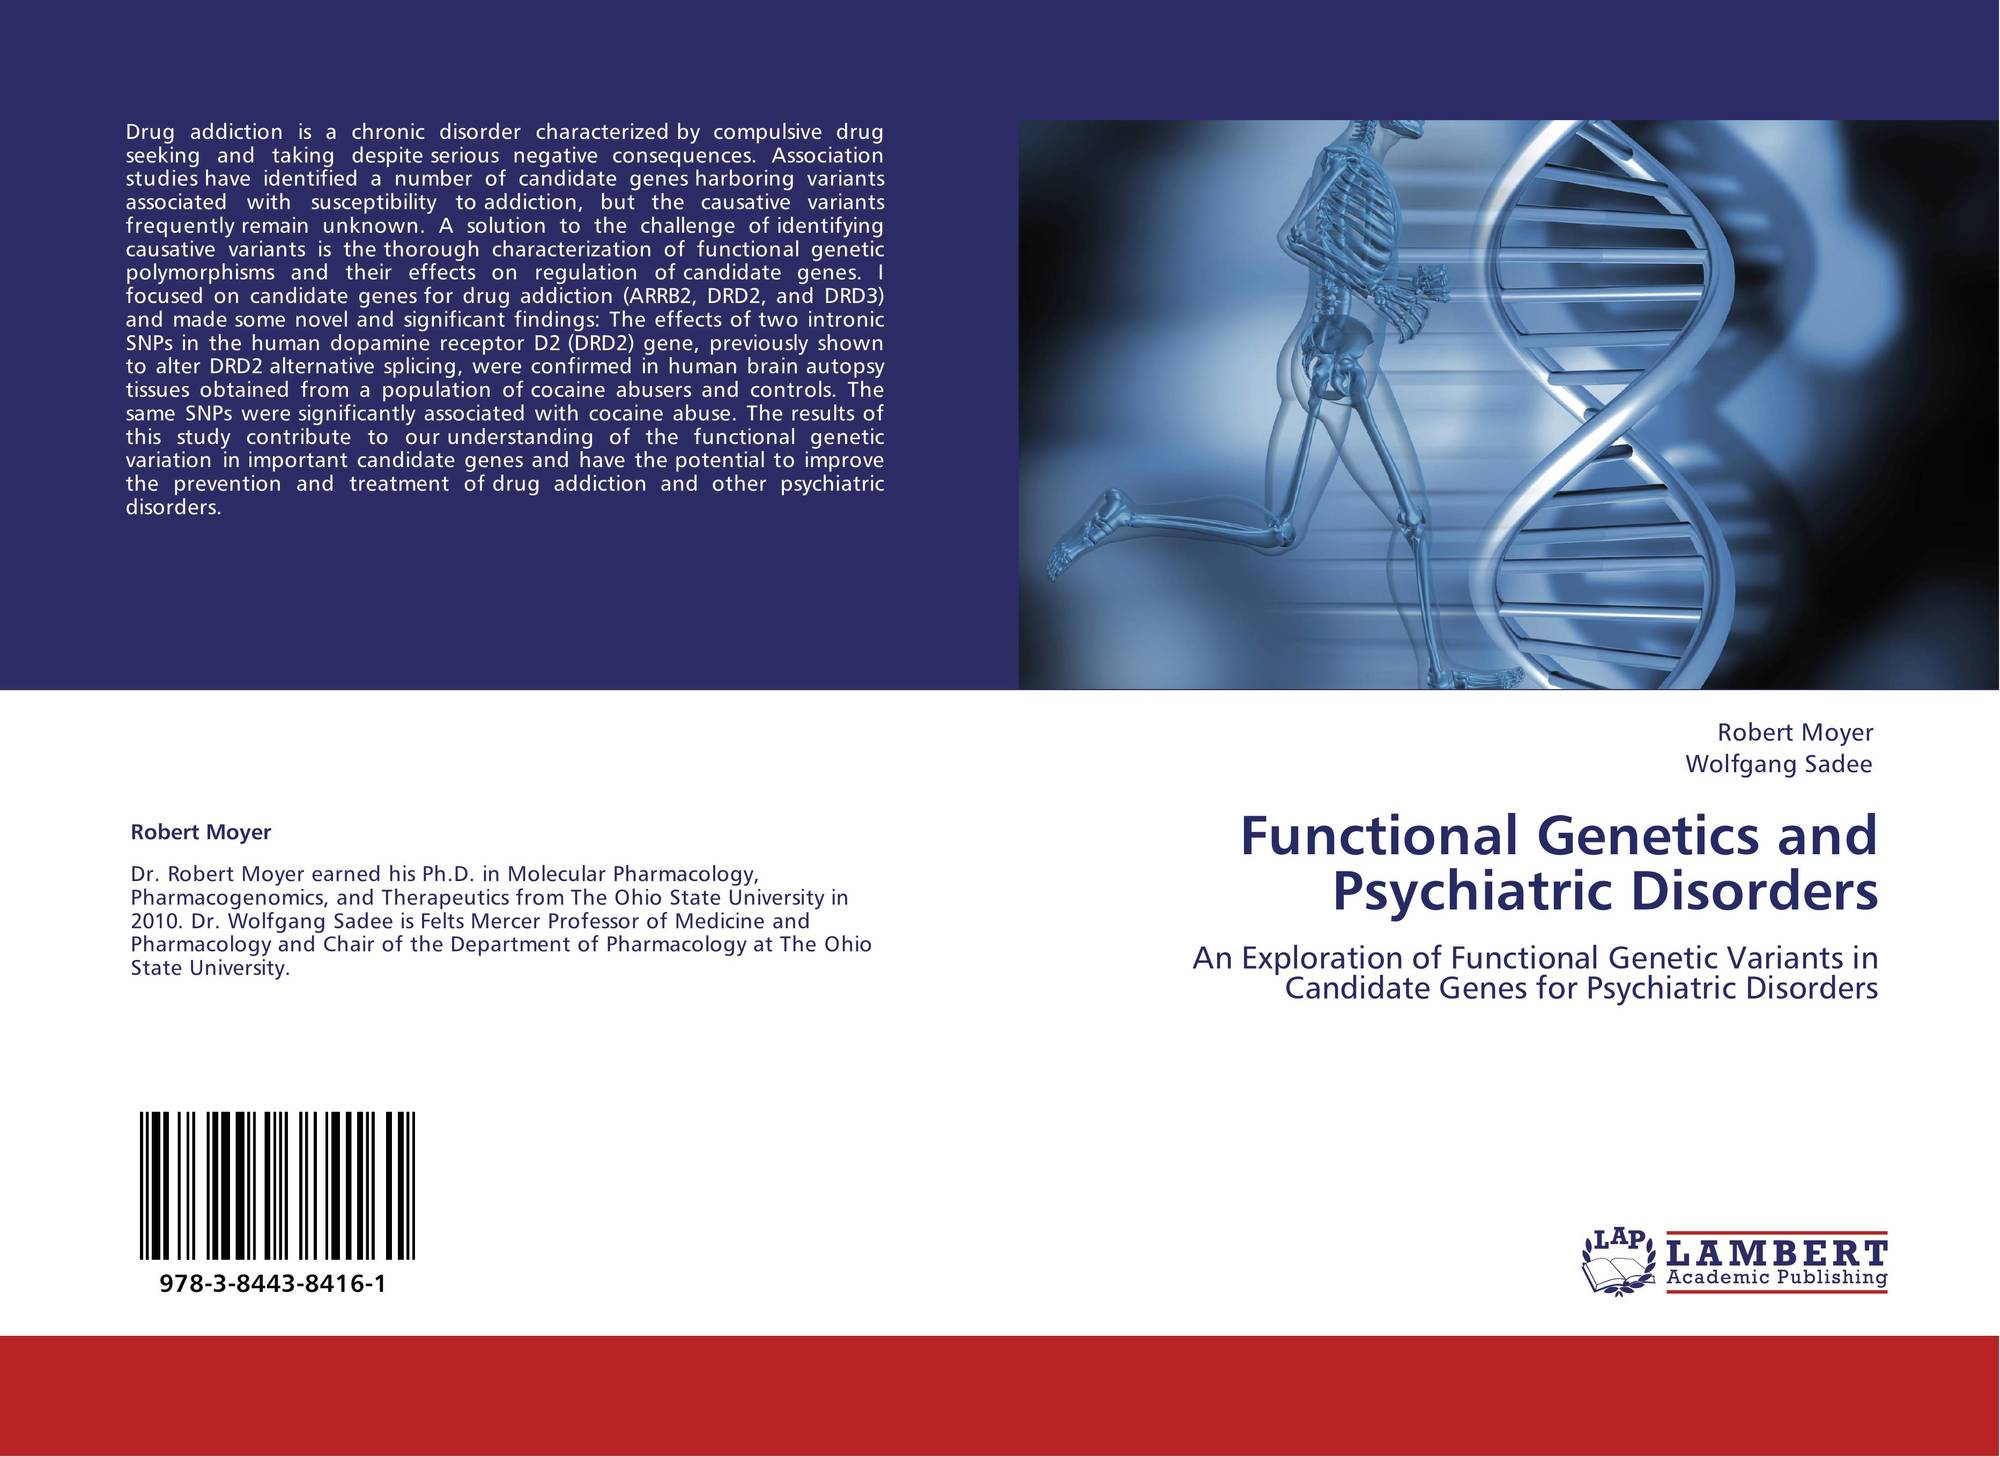 psychiatricpsychiatric disorders and disease sand drugs